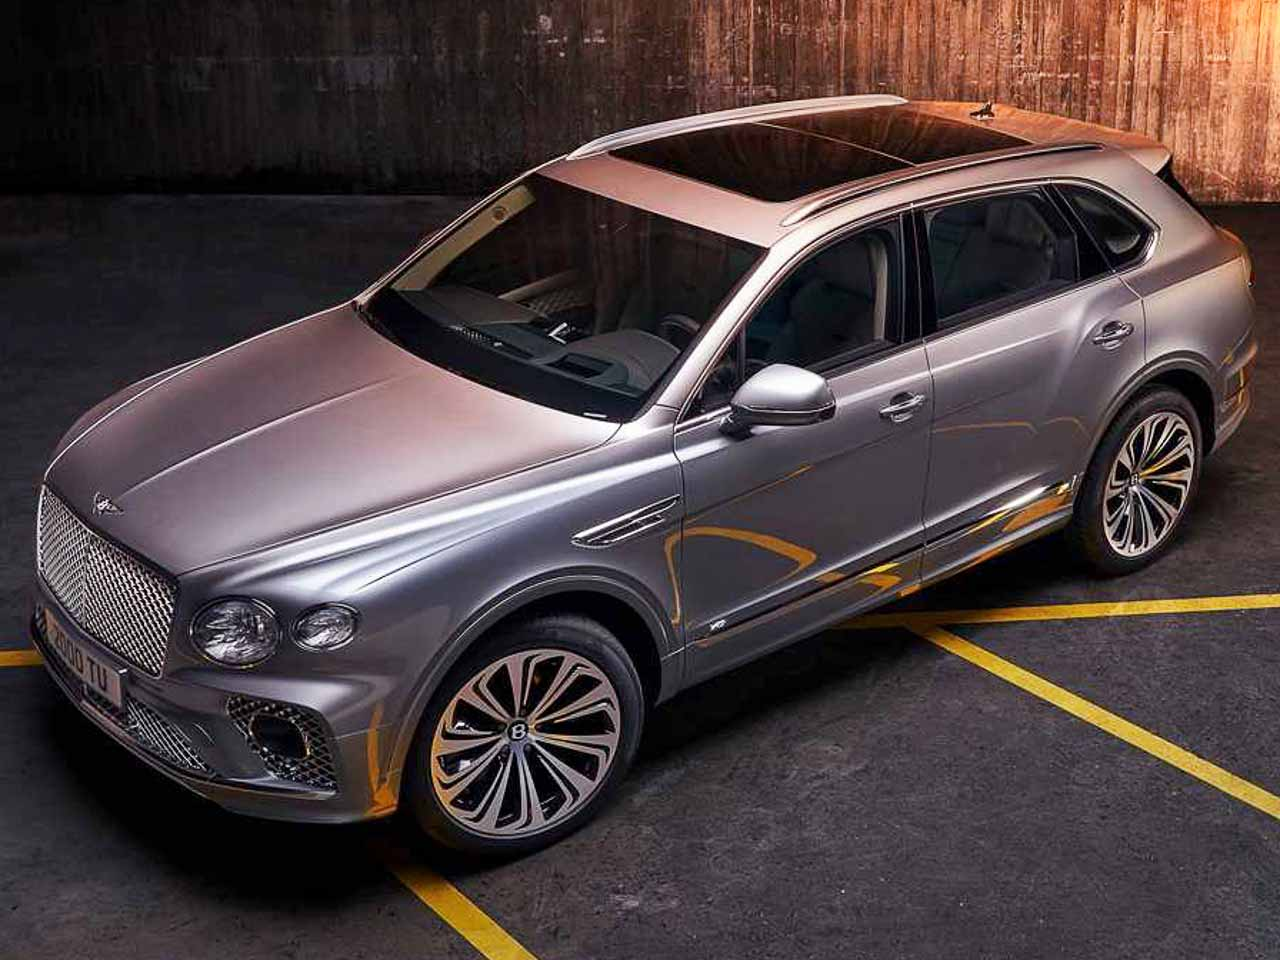 2021 Bentley Bentayga breaks cover with revised design